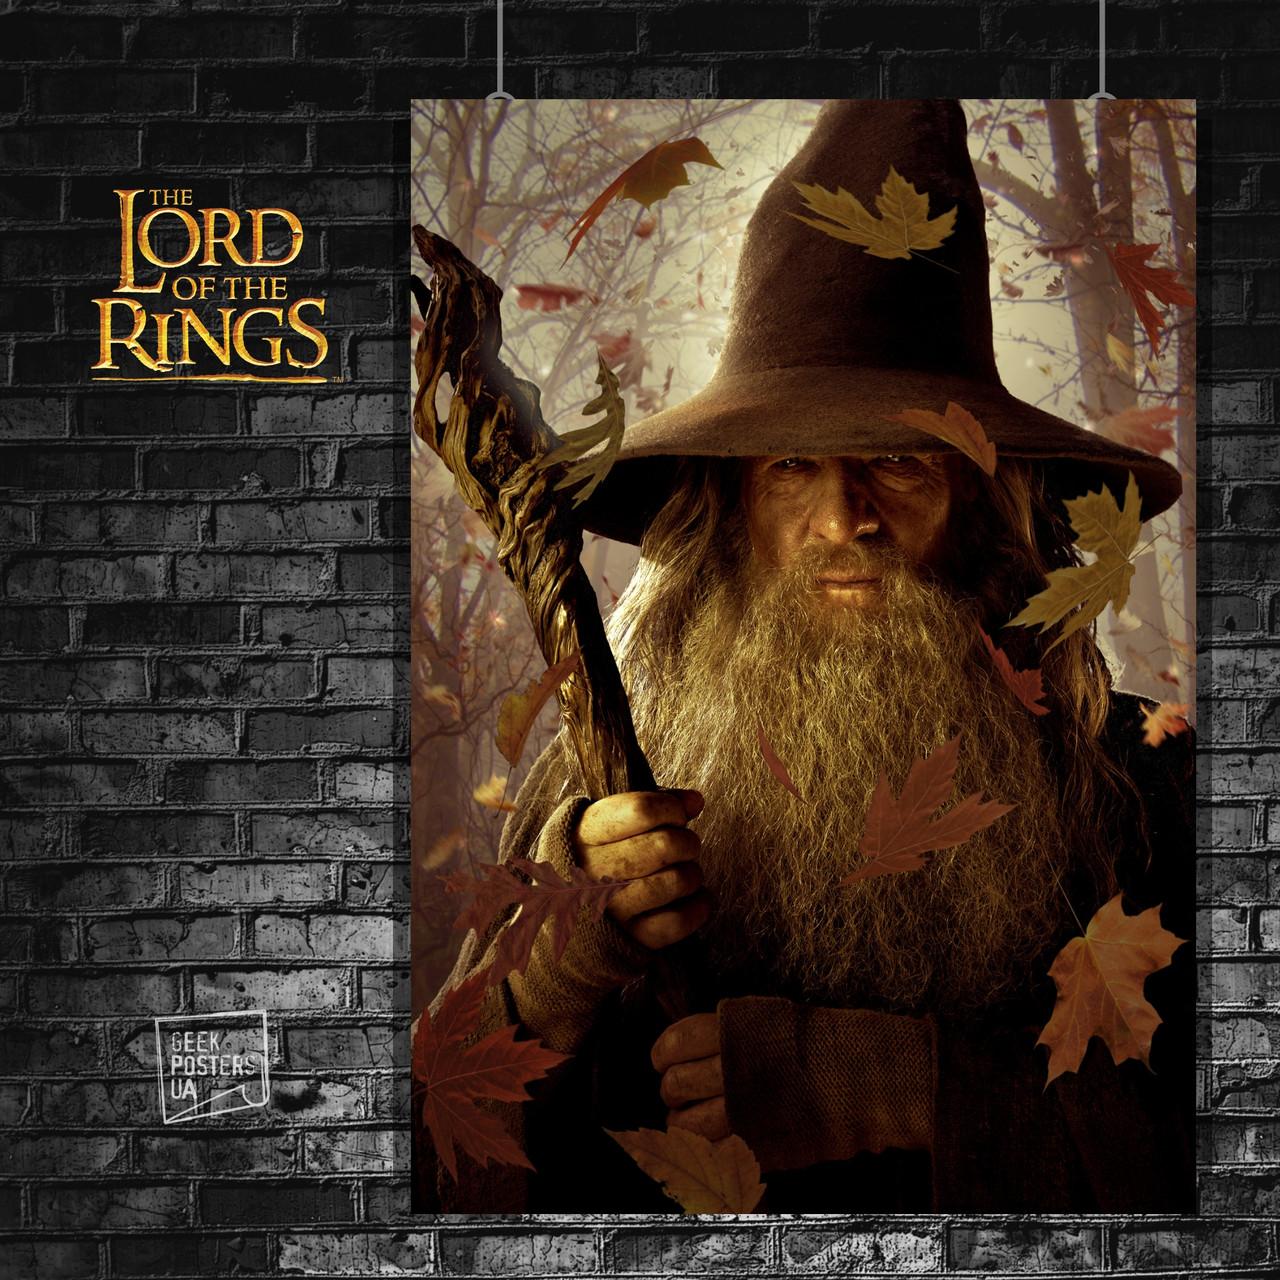 Постер Властелин Колец, Lord Of The Rings, Хоббит, Hobbit, LOTR. Размер 60x41см (A2). Глянцевая бумага